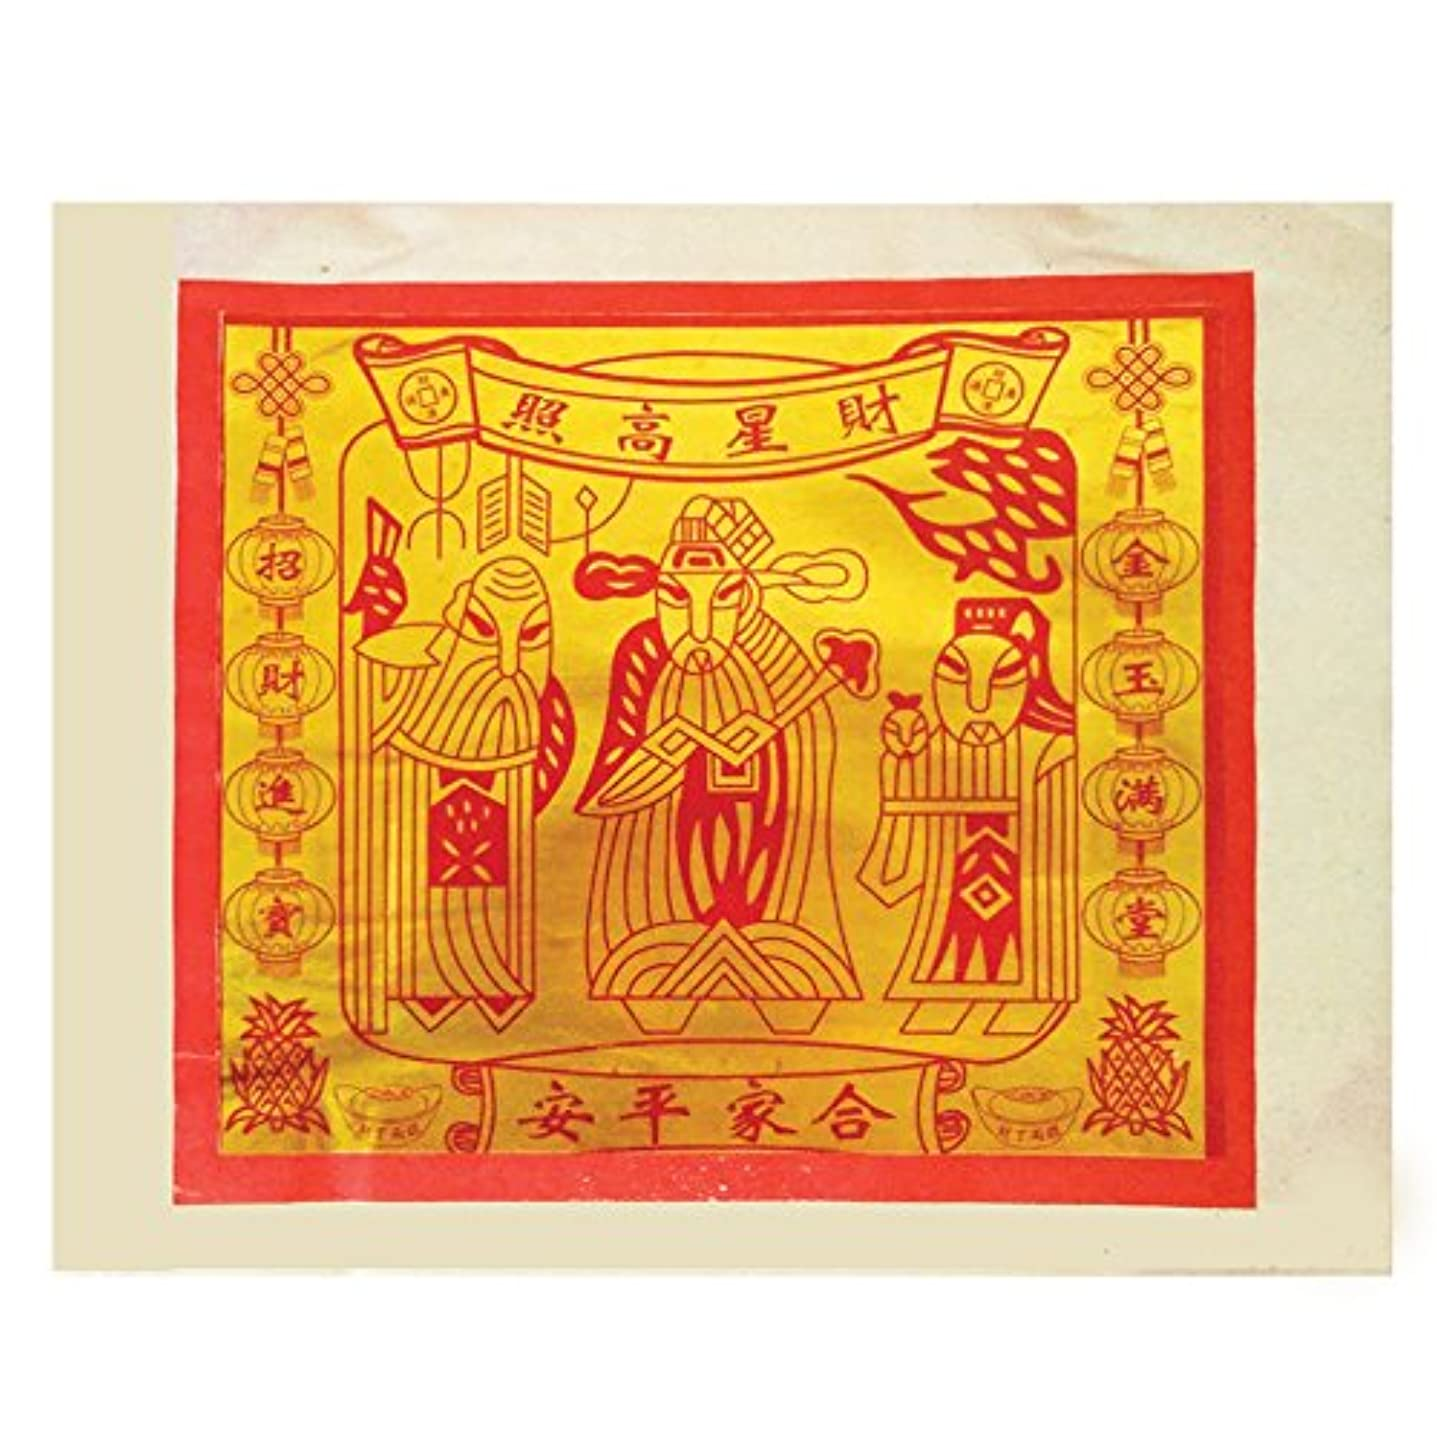 80pcs Incense用紙/ Joss用紙with Gold Foil ( Mediumサイズ) 10.6インチx 10.4インチ